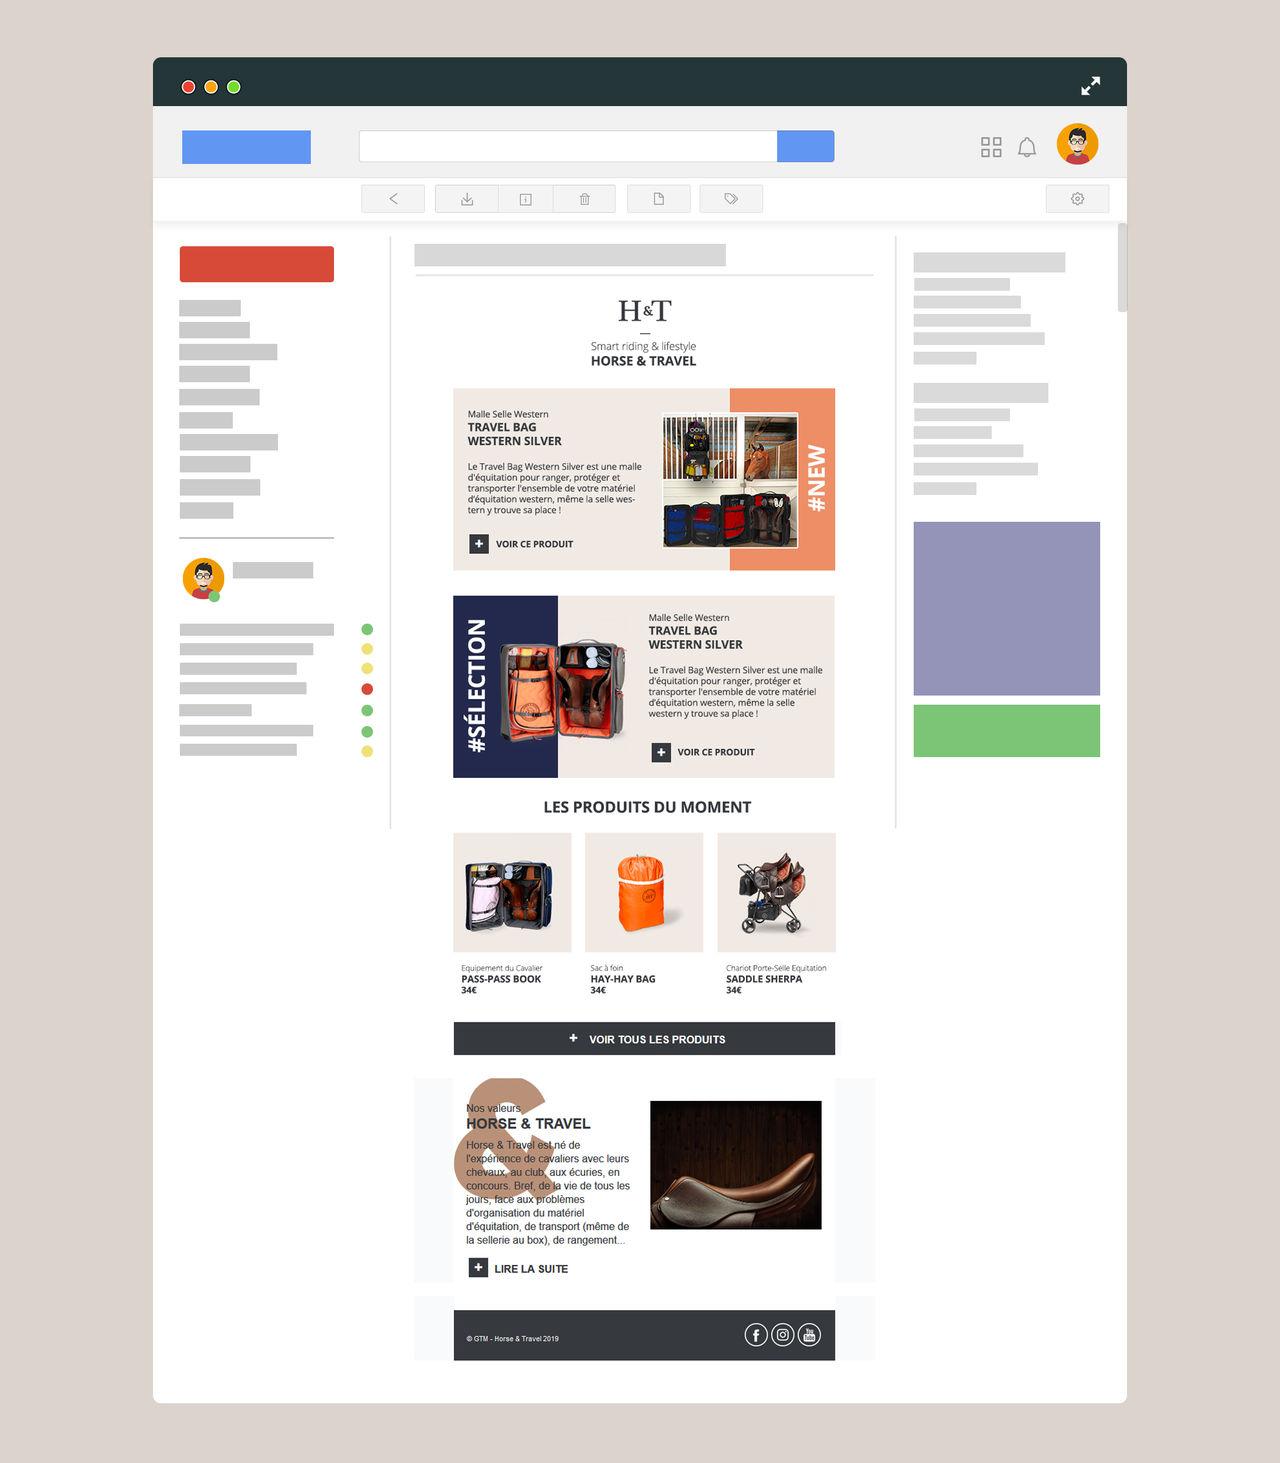 Création et intégration emailing